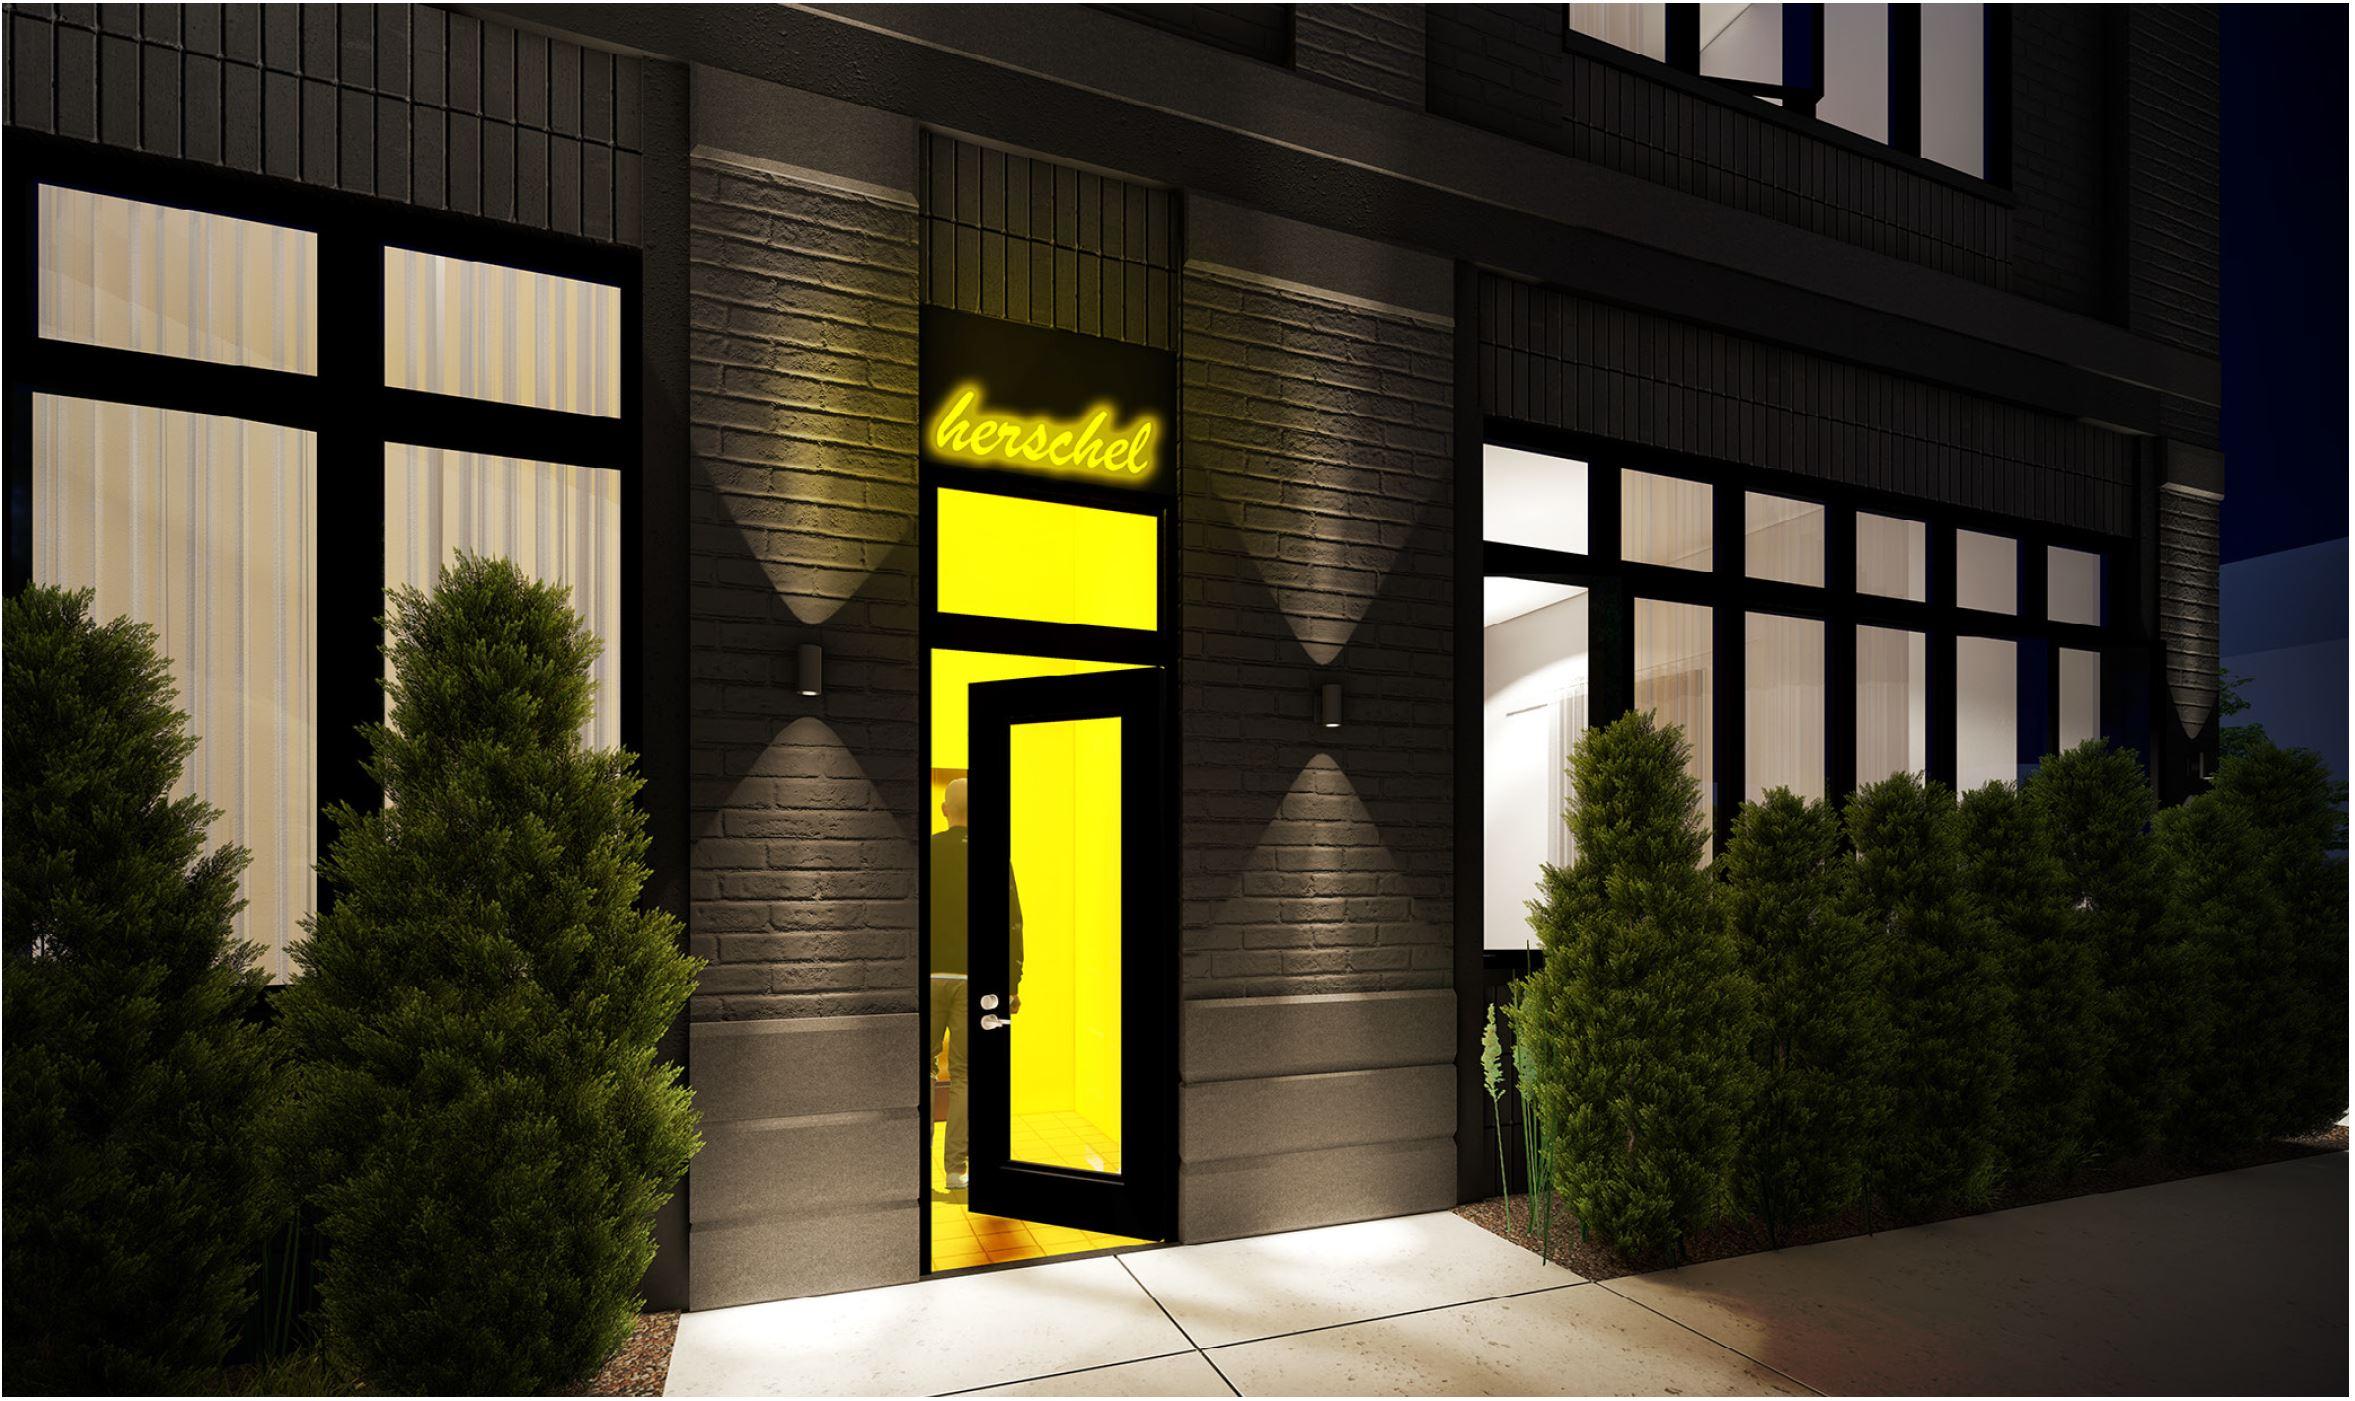 Night View Residential Entry.JPG